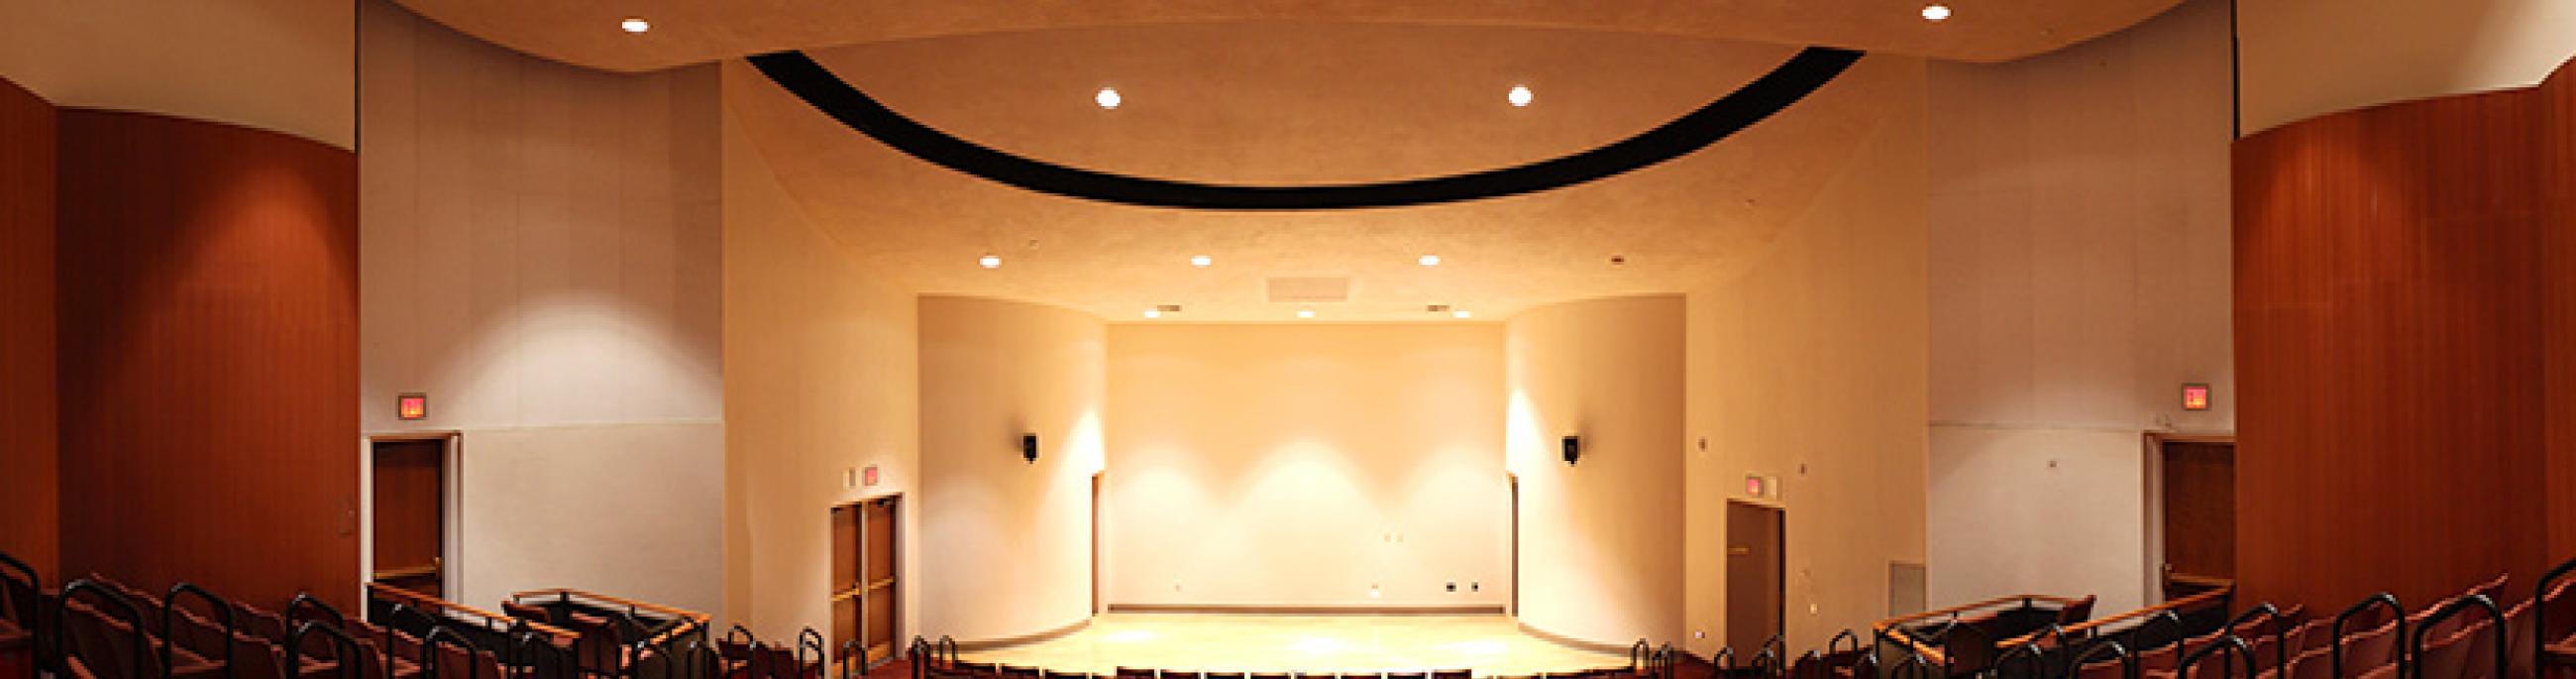 CCA Recital Hall Seating